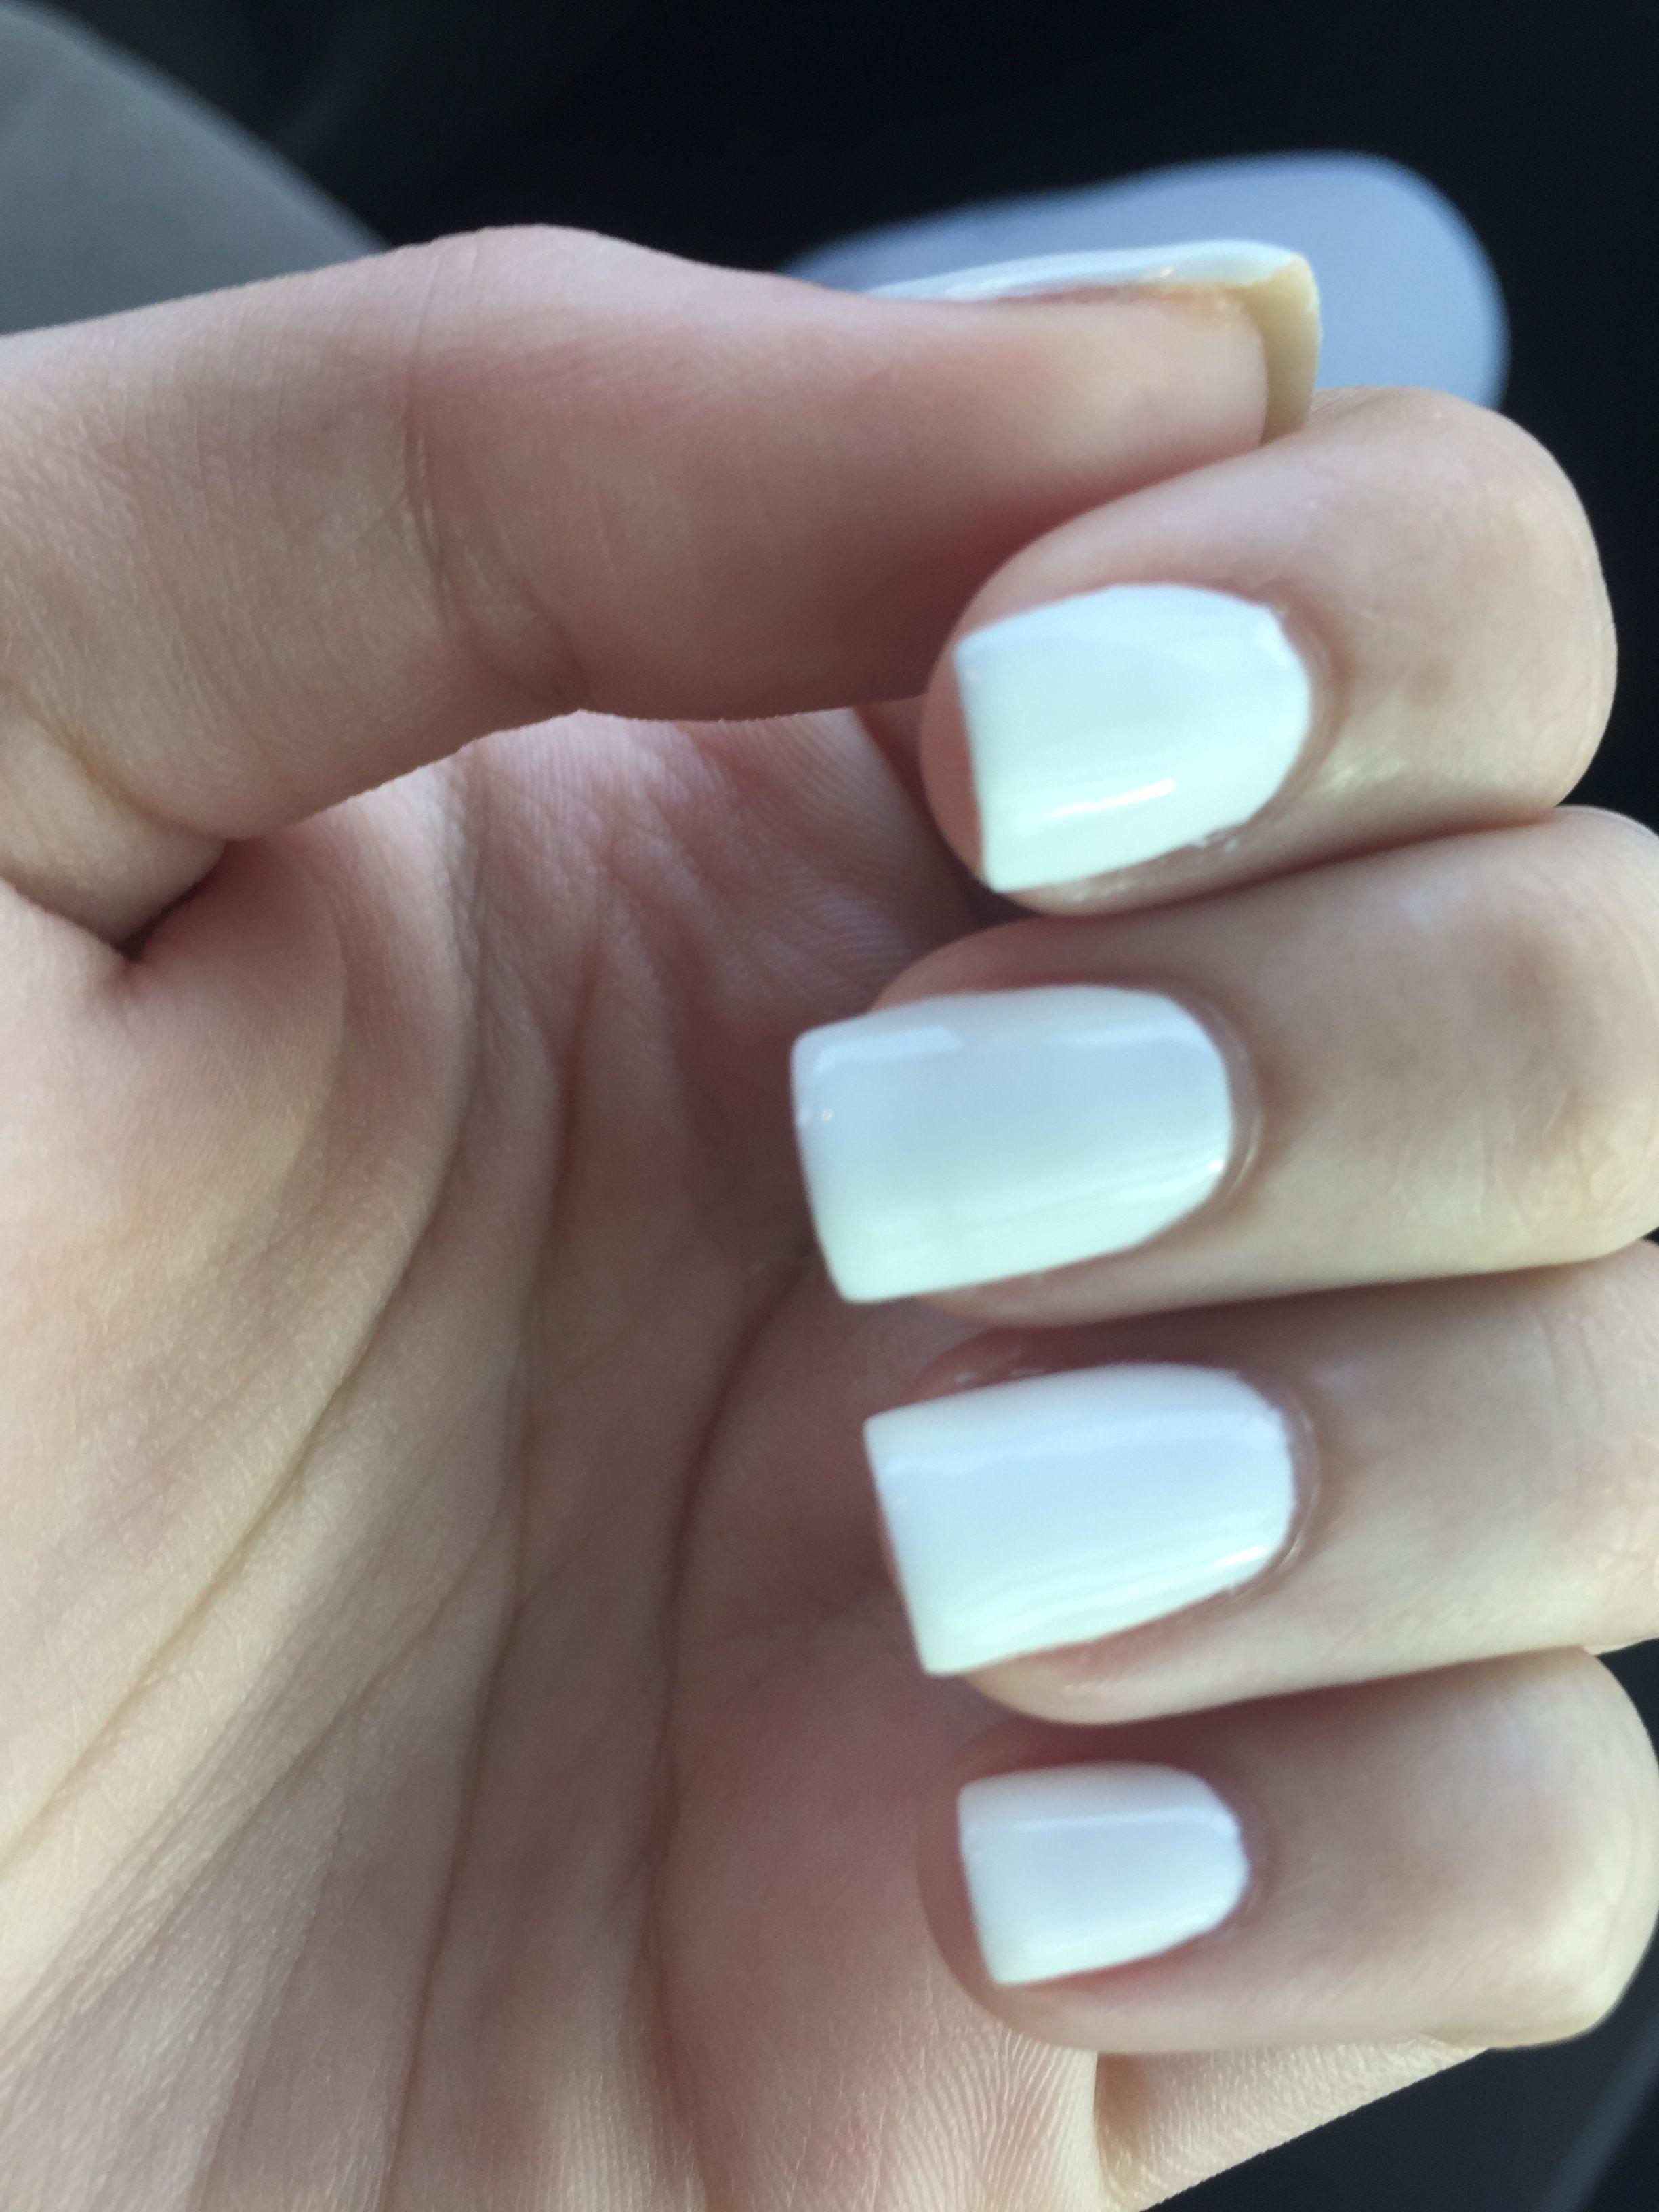 Nails Gelnails White Short Gel Nails Short Gel Nails Nails Gel Nails